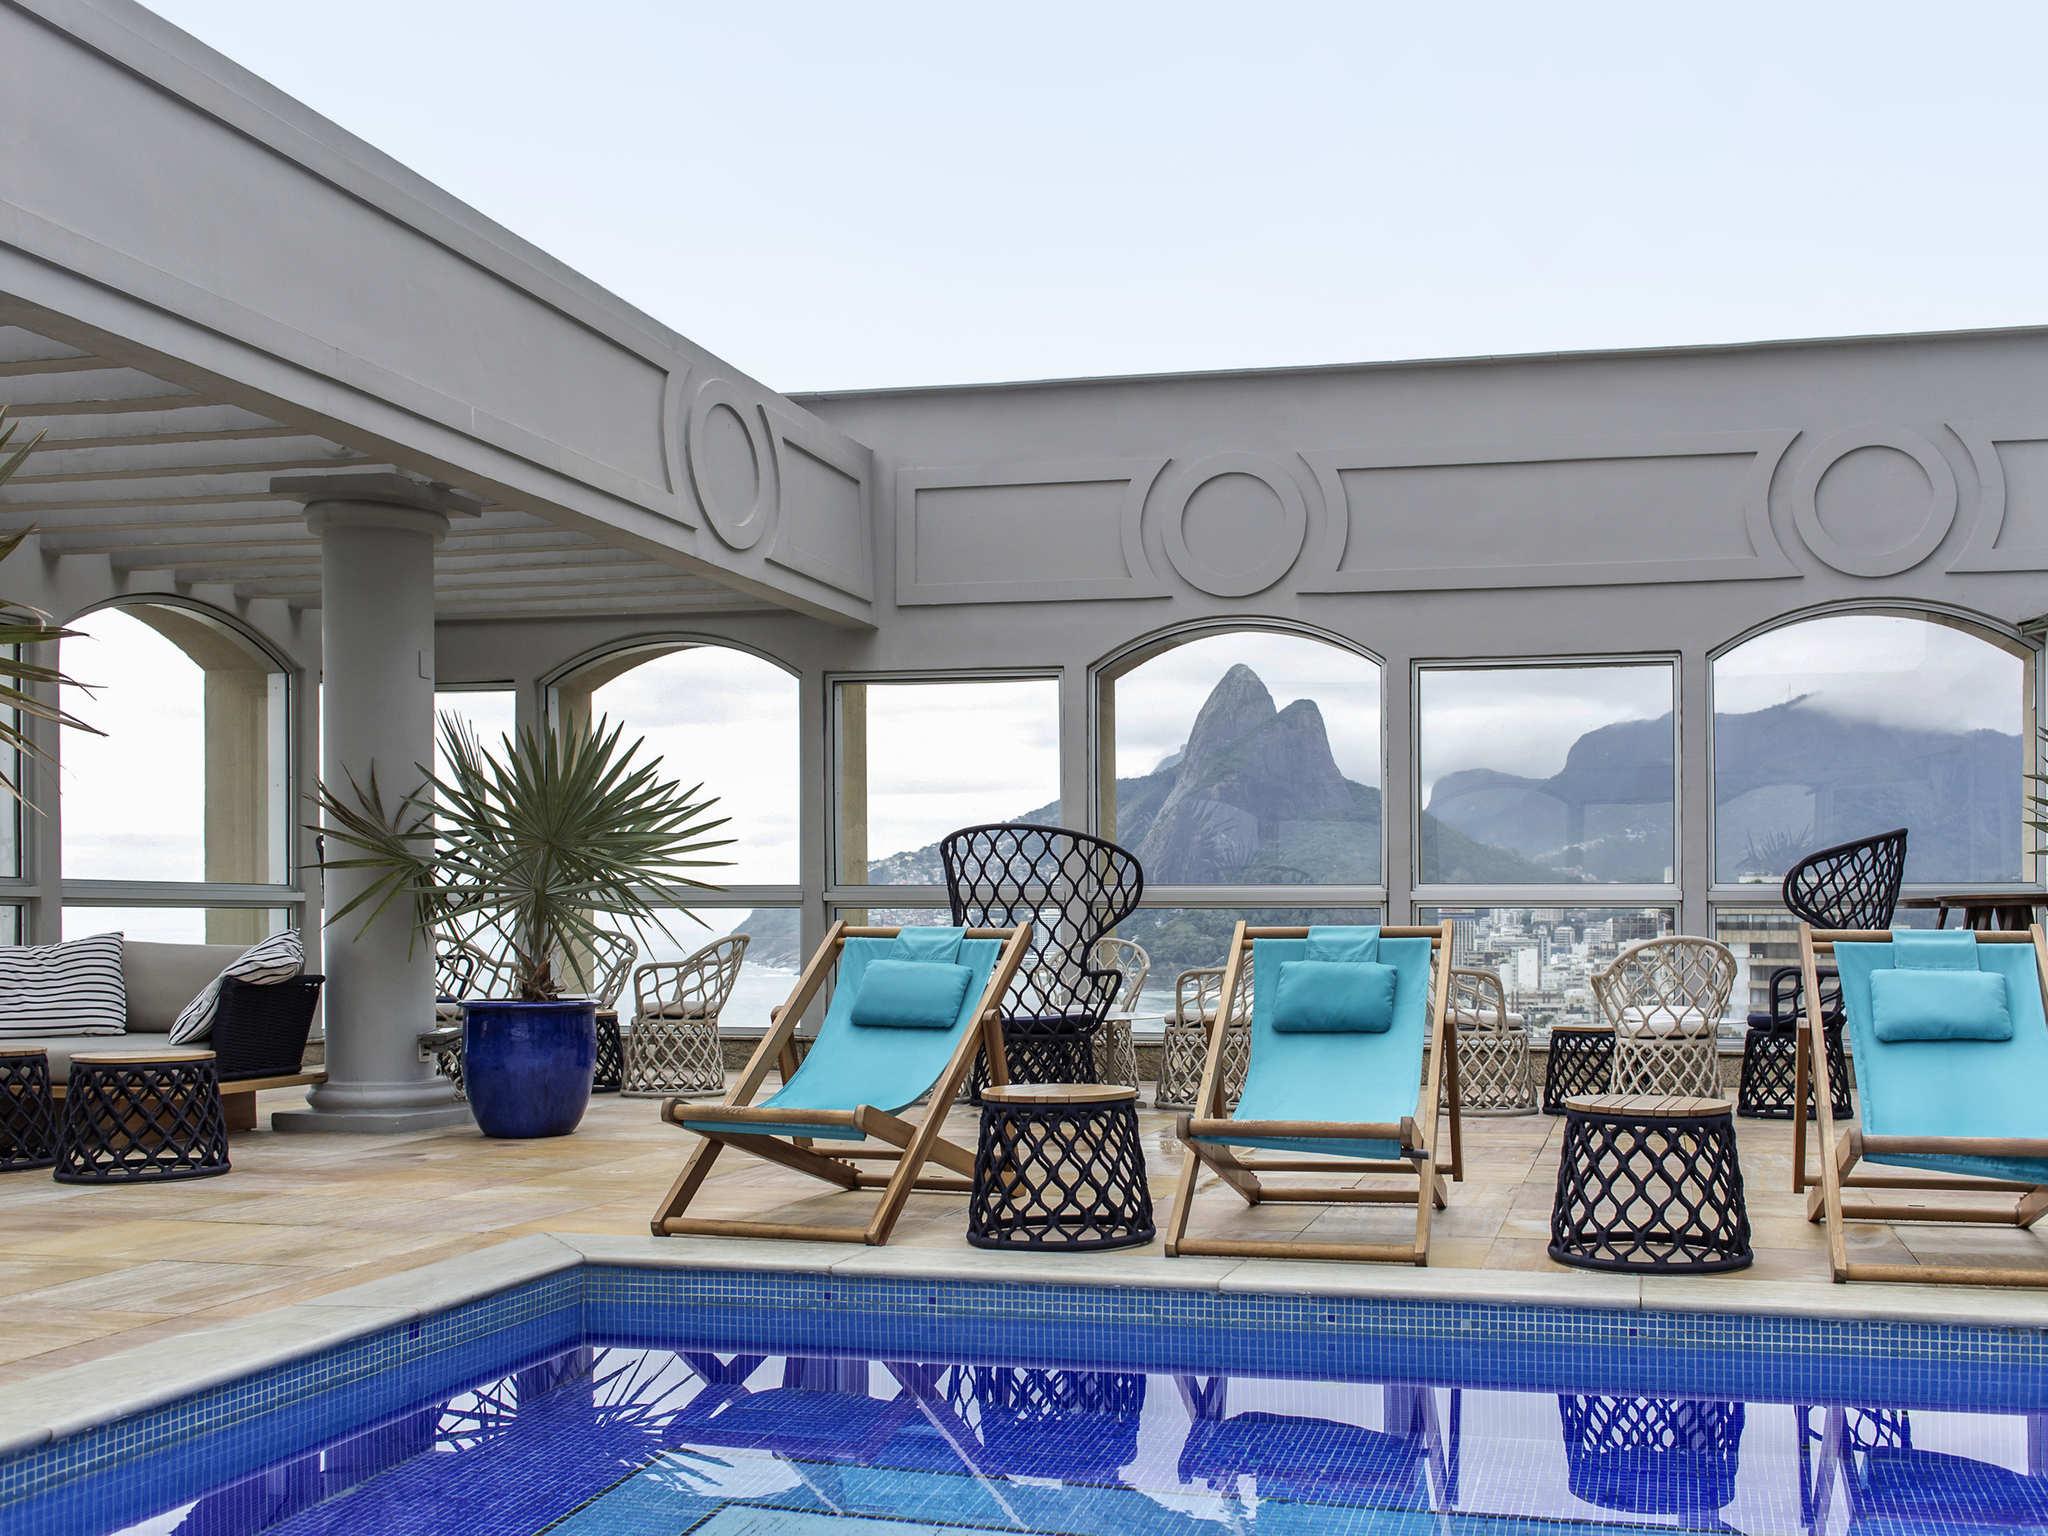 Otel – Sofitel Rio de Janeiro Ipanema